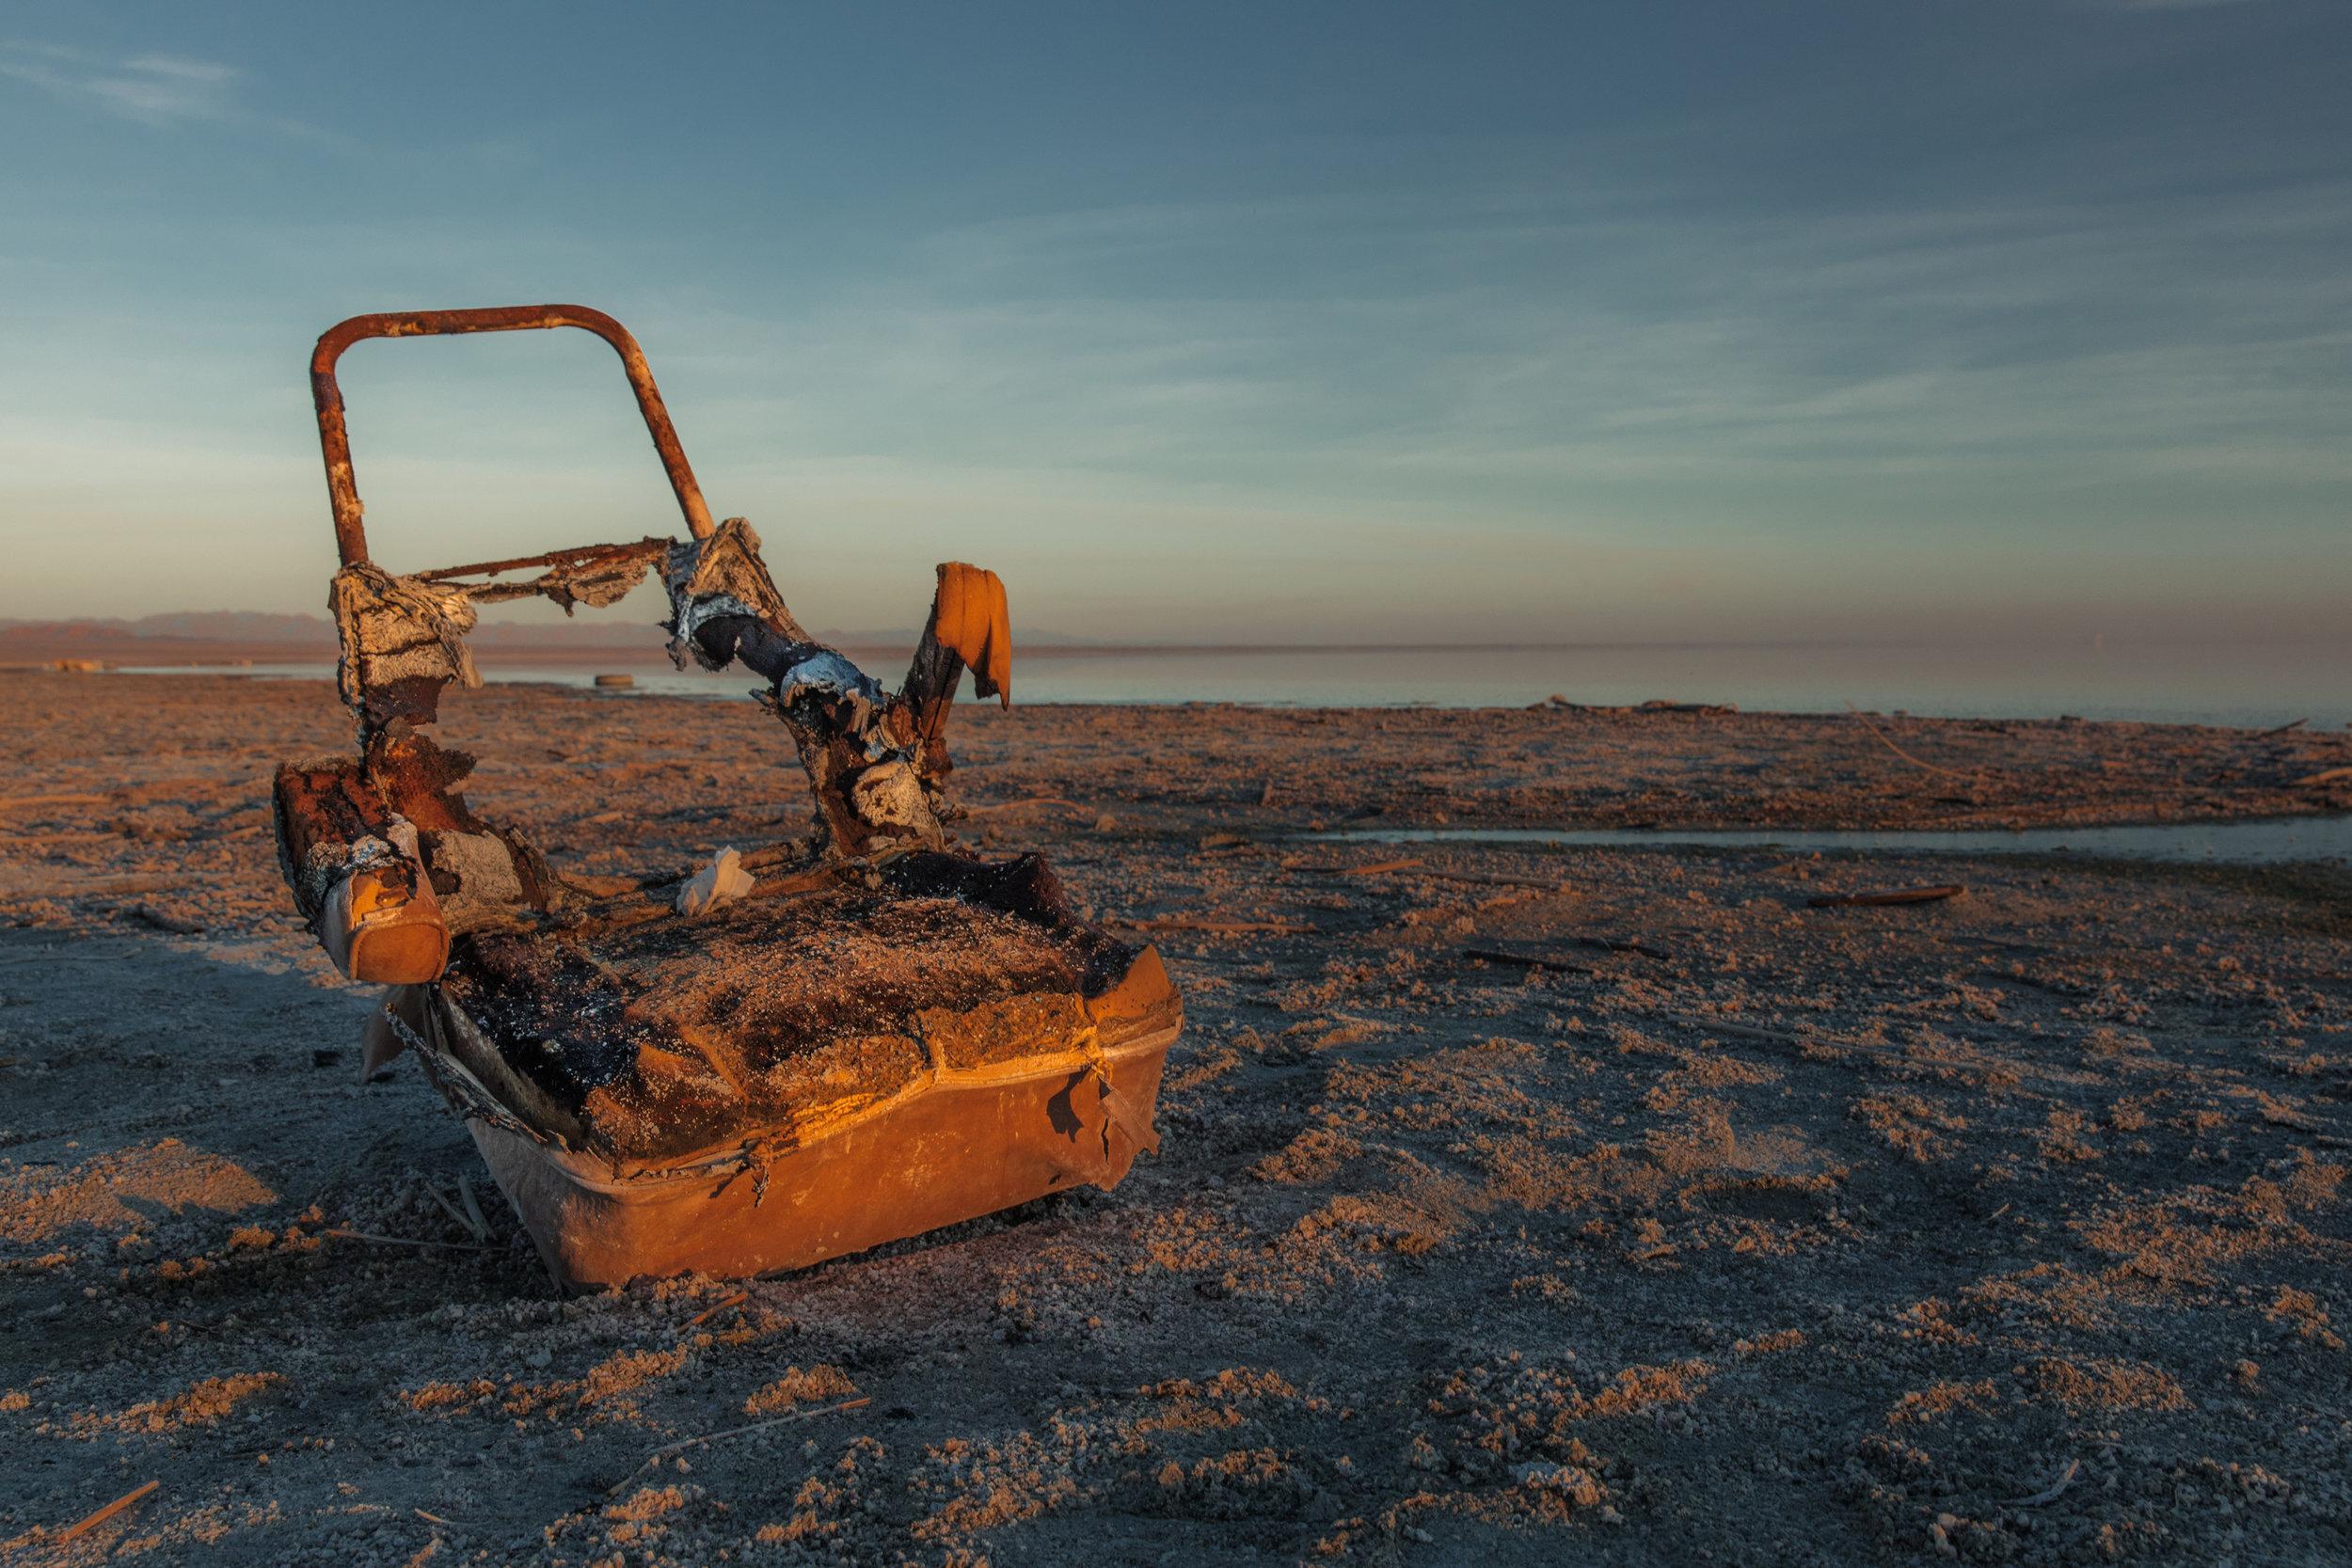 salton-sea-bombay-beach-180117-0956.jpg